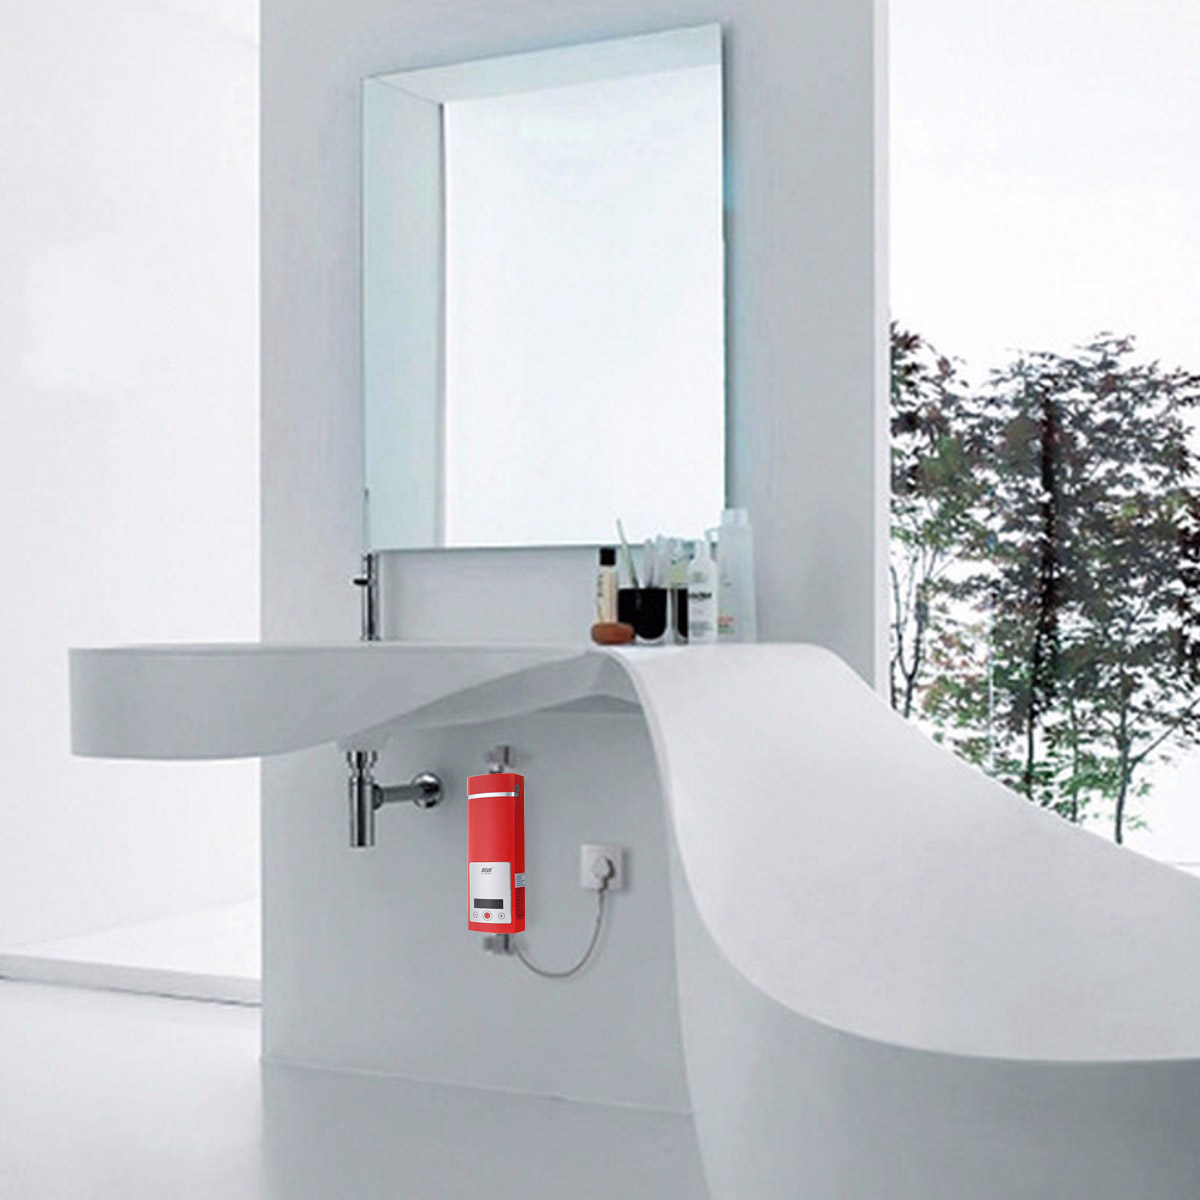 5500w lcd chauffe eau electrique r chauffeur instantan douche vier robinet achat vente. Black Bedroom Furniture Sets. Home Design Ideas